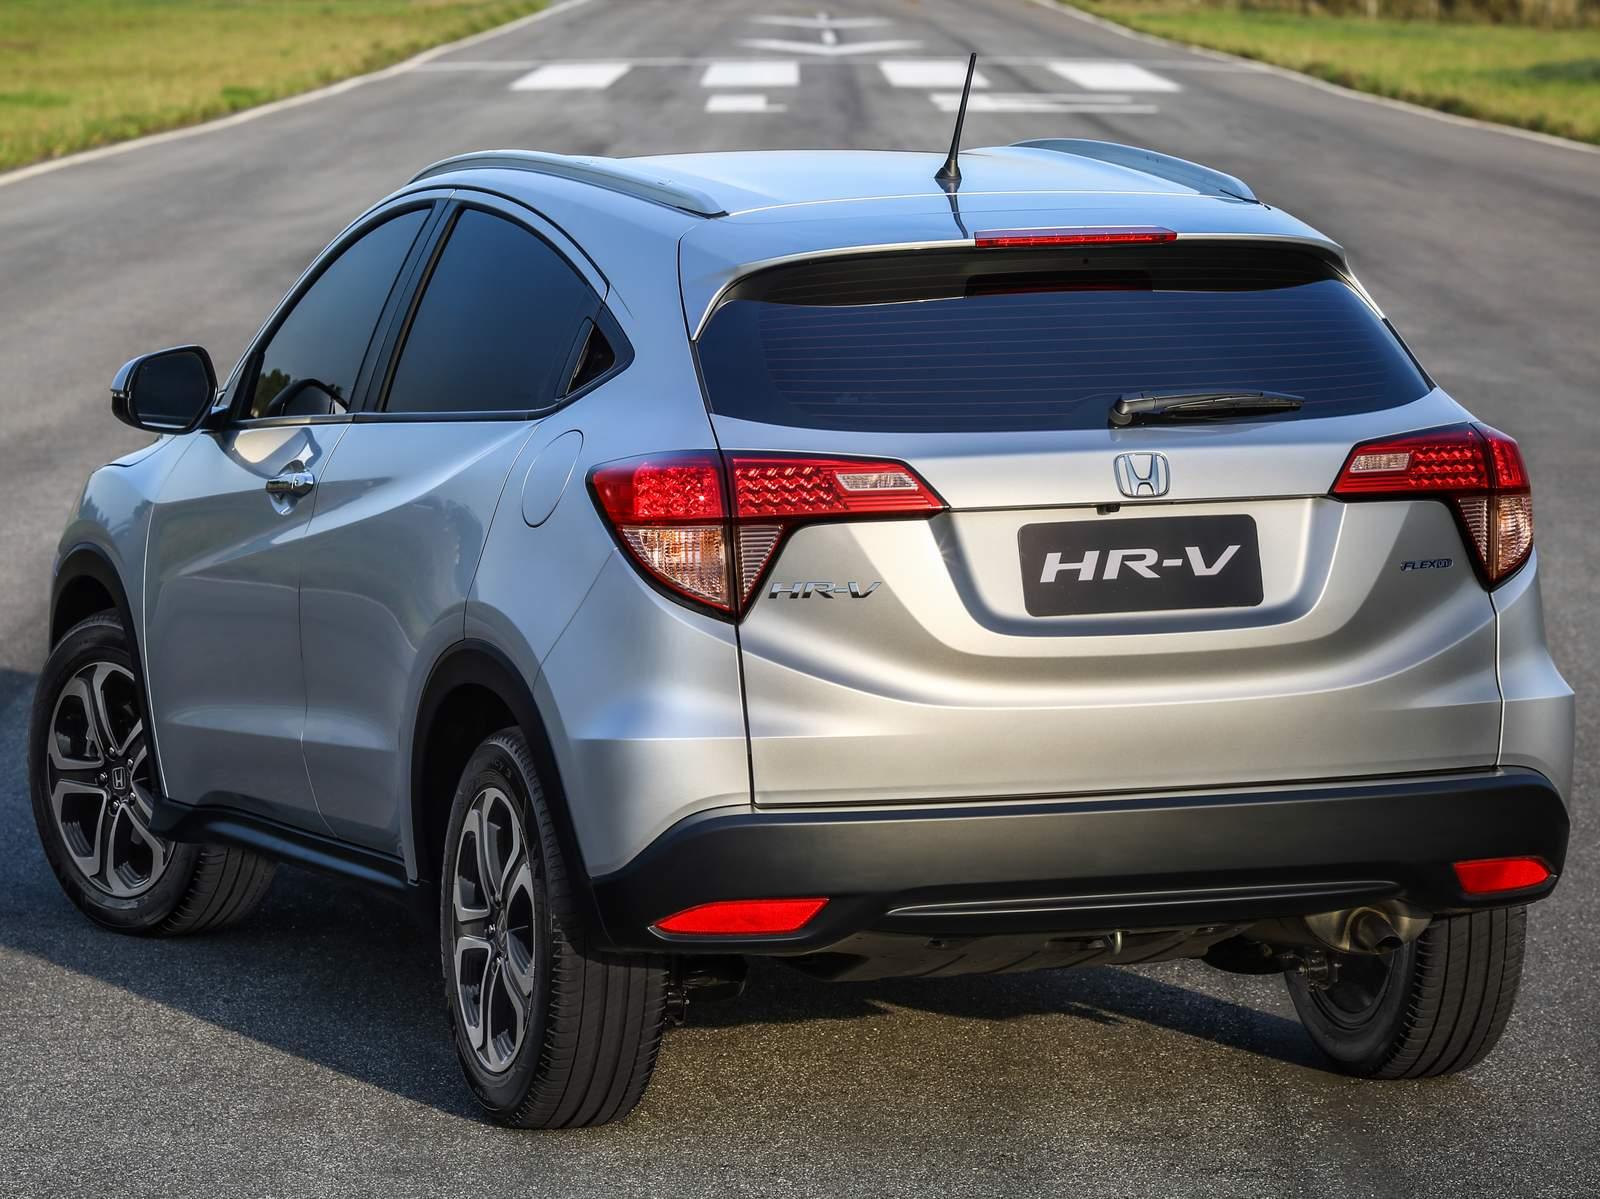 Honda HR-V 2015 (7)